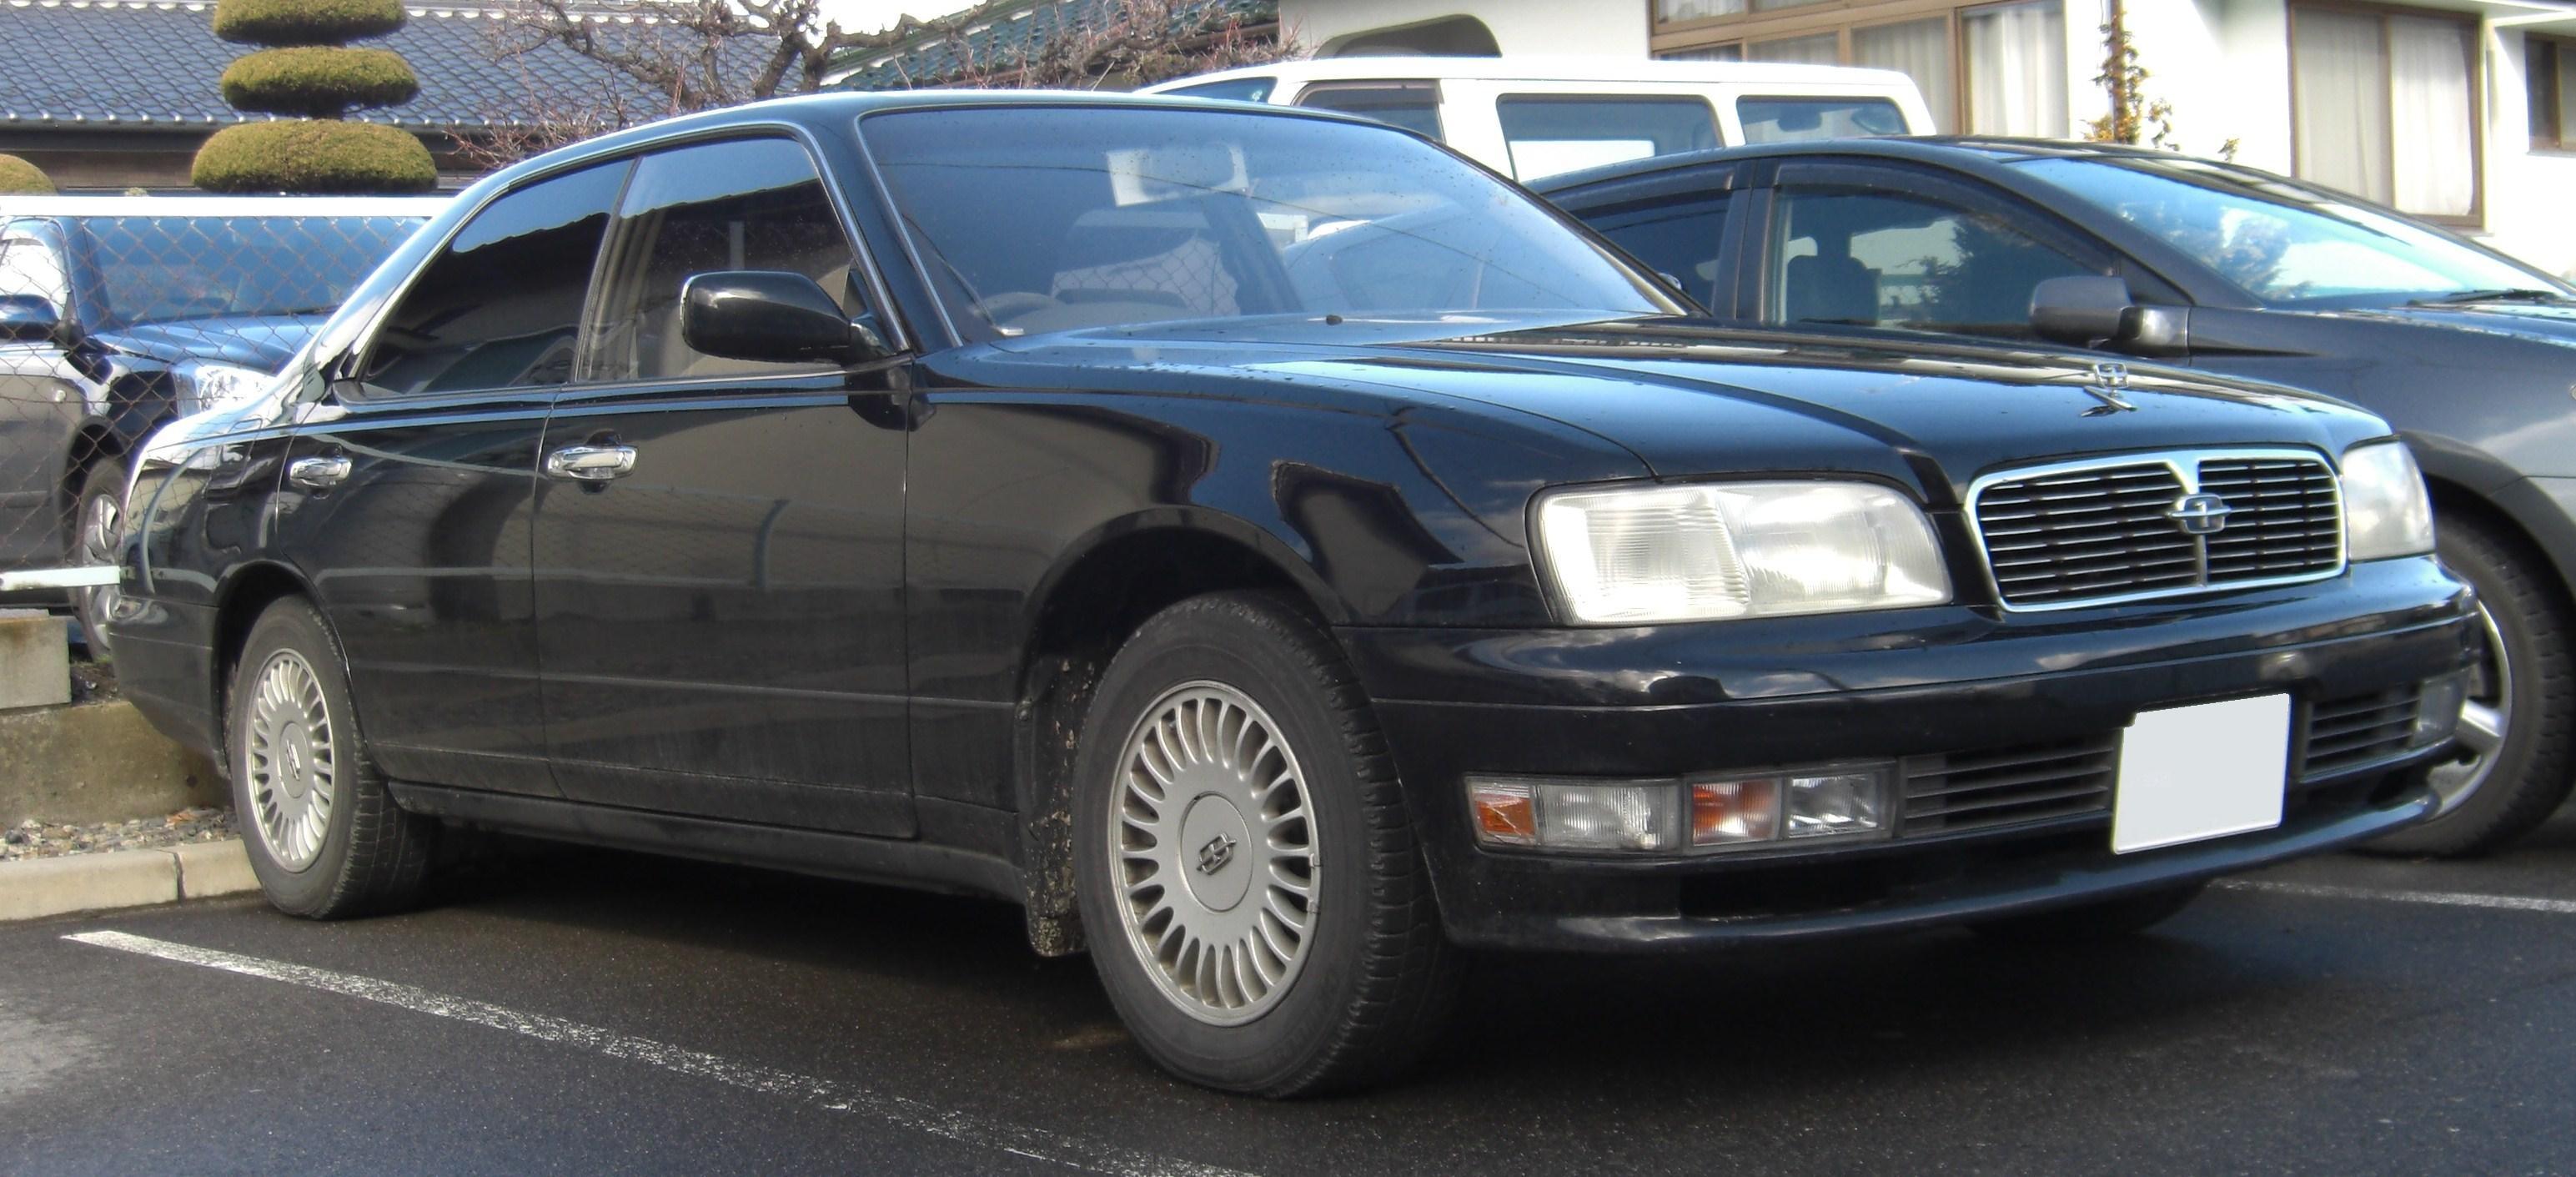 resimleri: Nissan - Cedric (Y34) - 3.0 i V6 24V (280 Hp